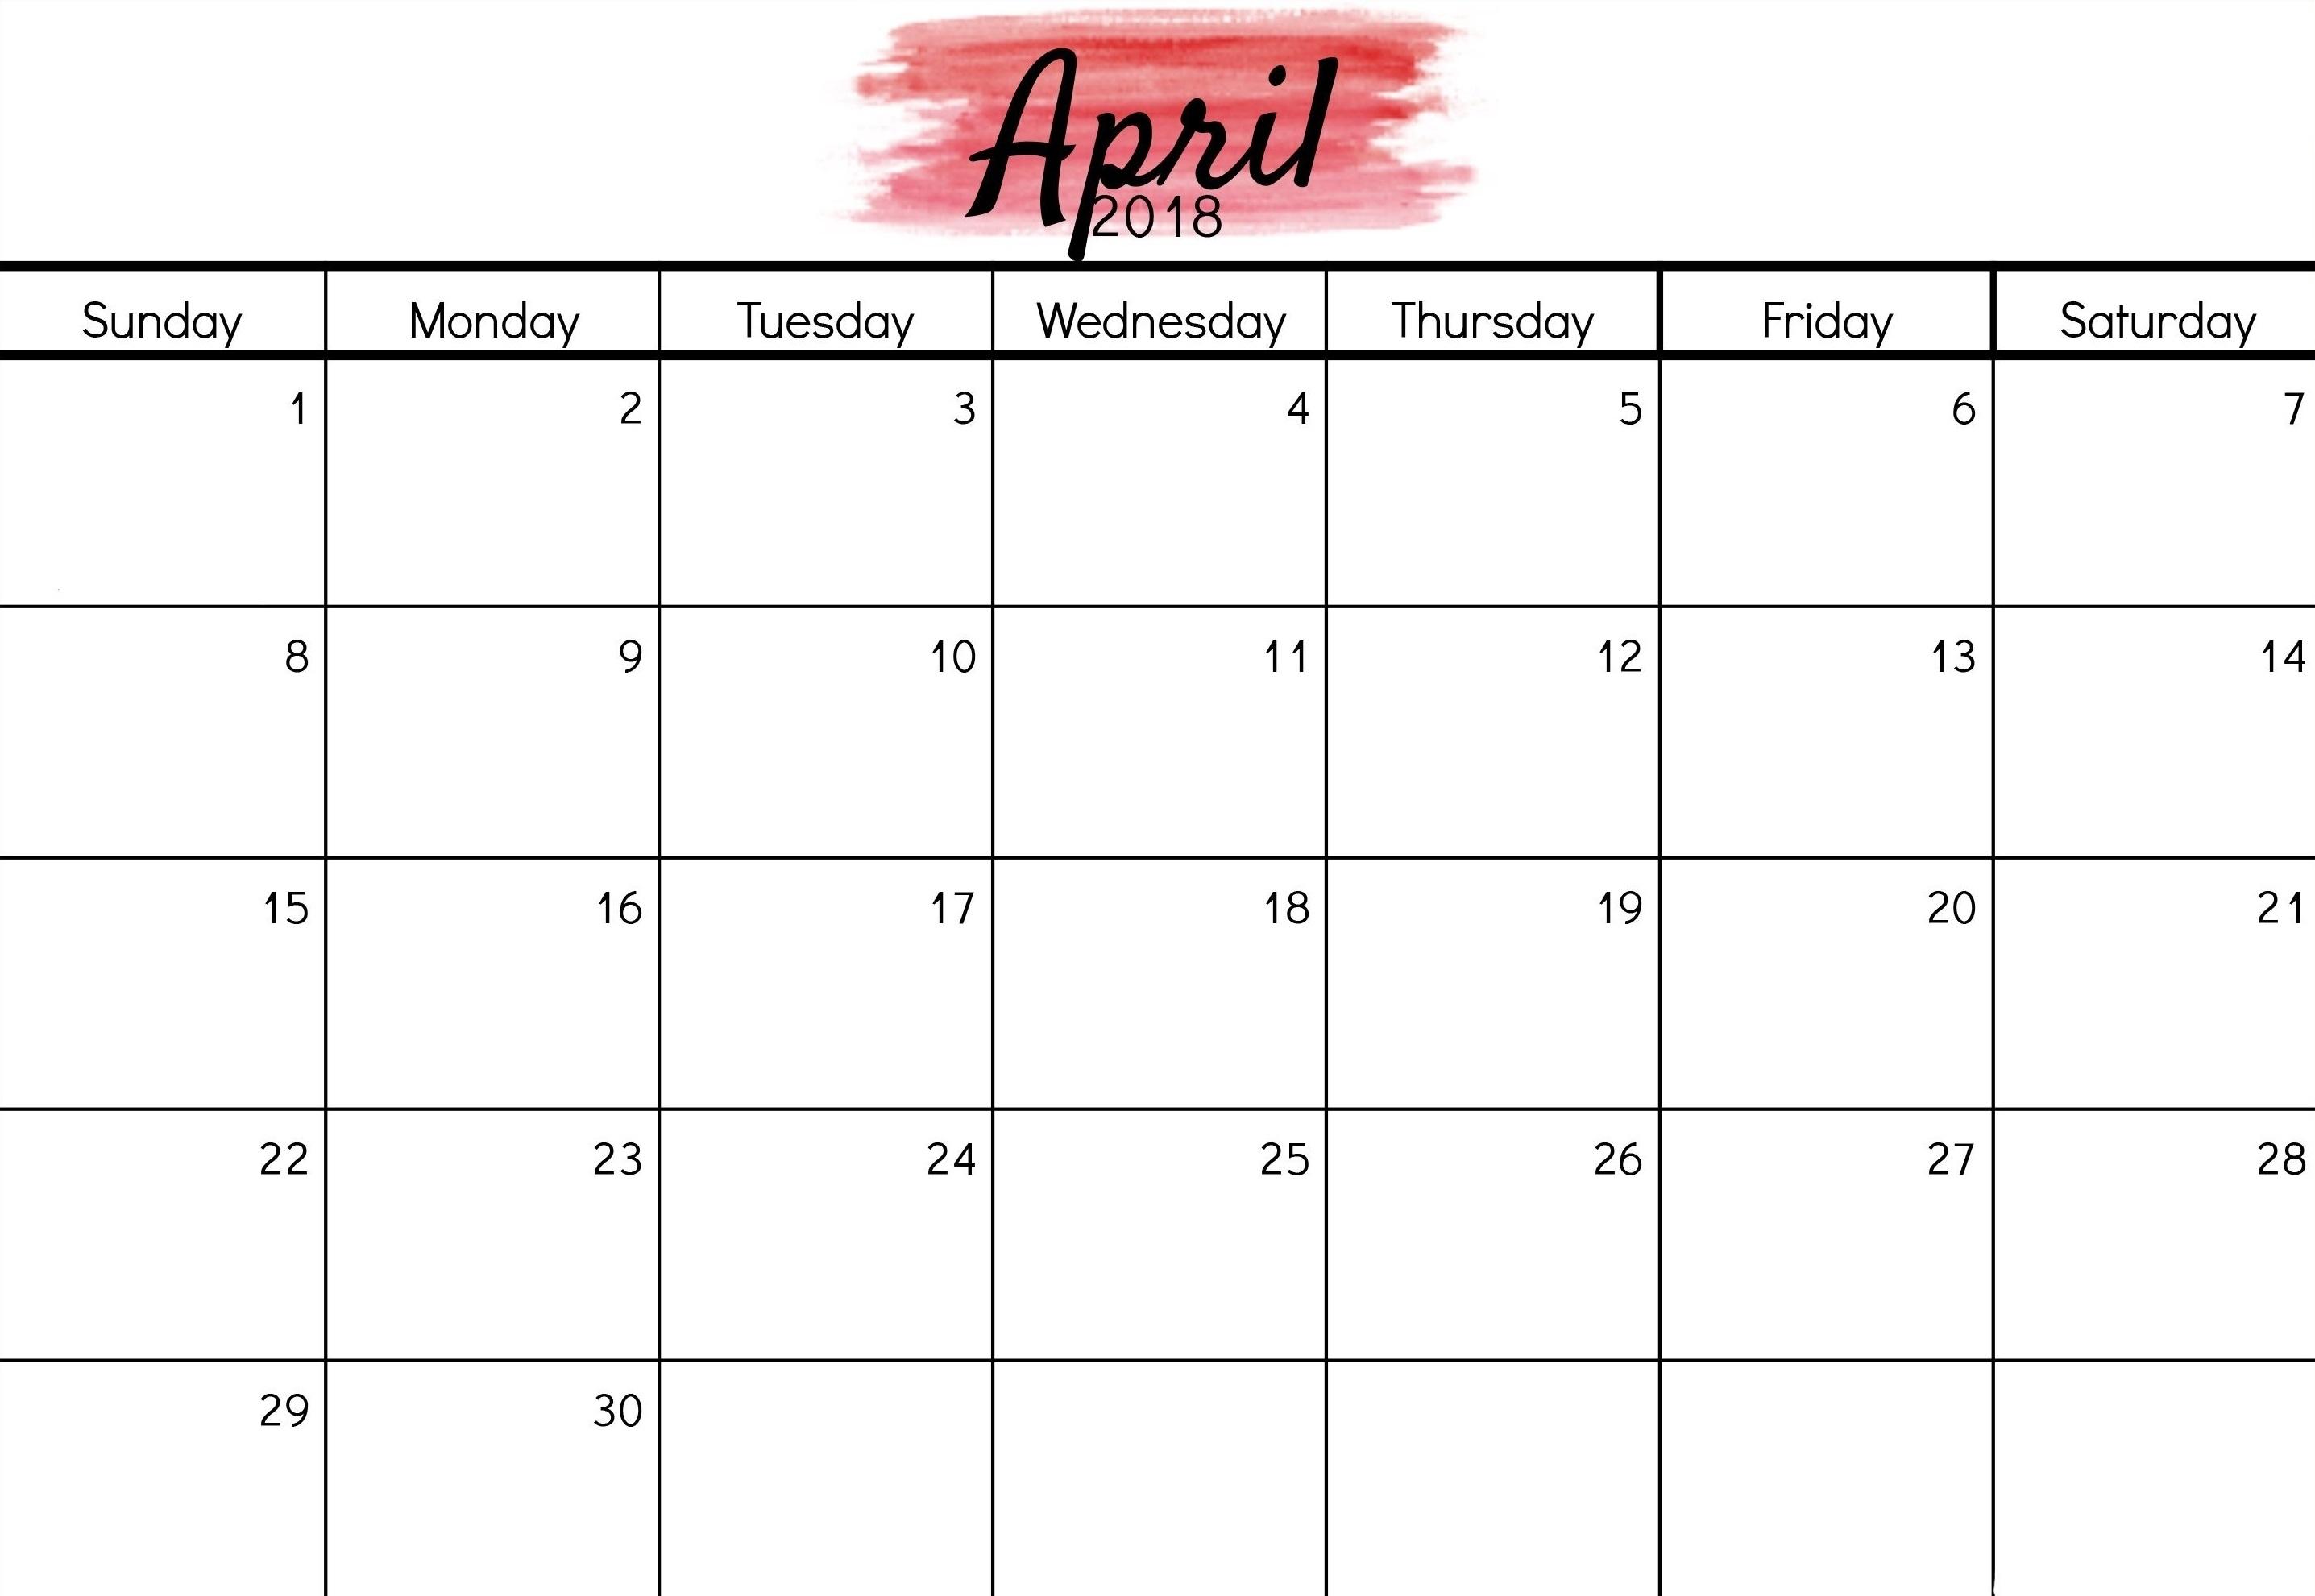 Free April 2018 Calendar Printable | Calendarbuzz